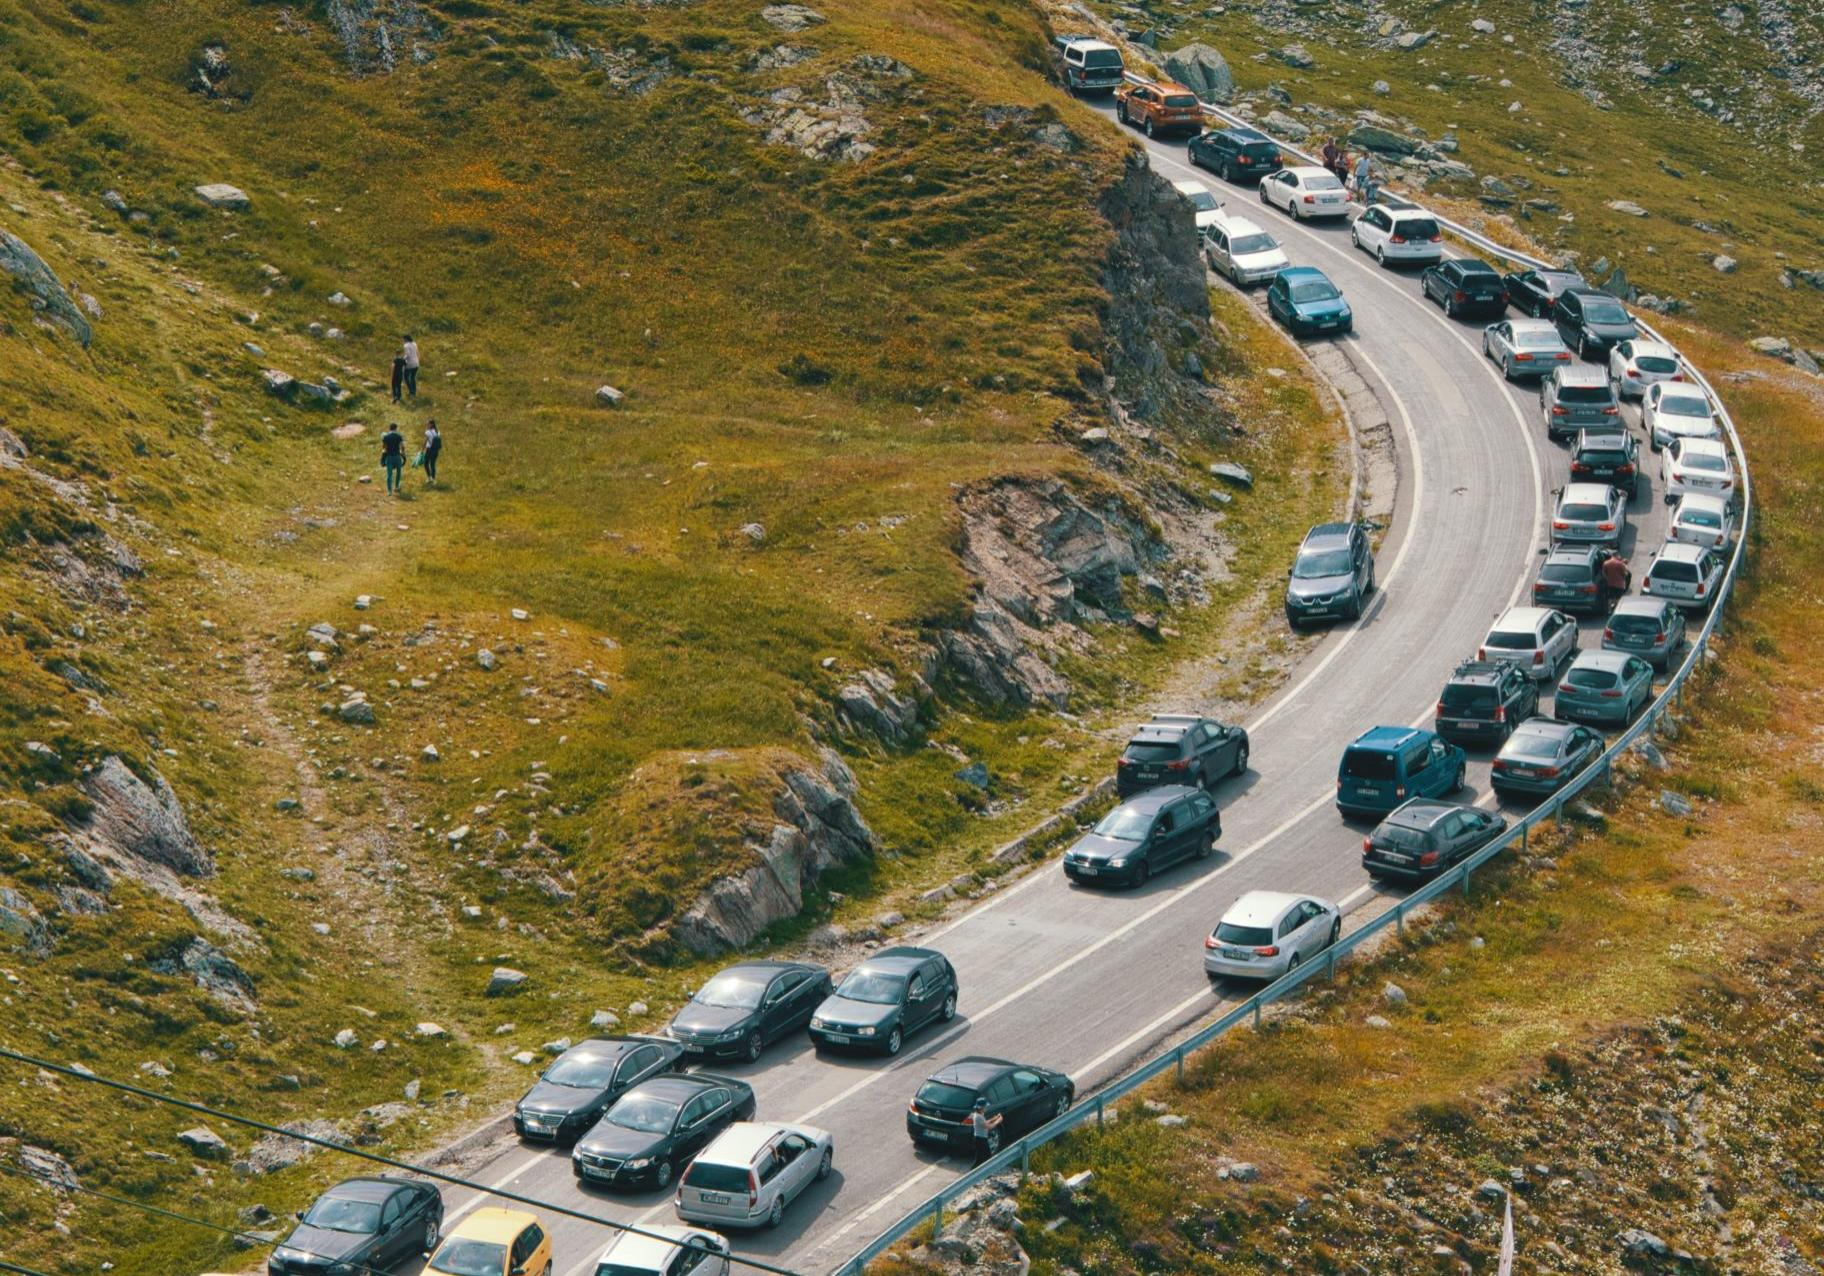 nomadic-julien-25Zw01Q3uGQ-unsplash (1)